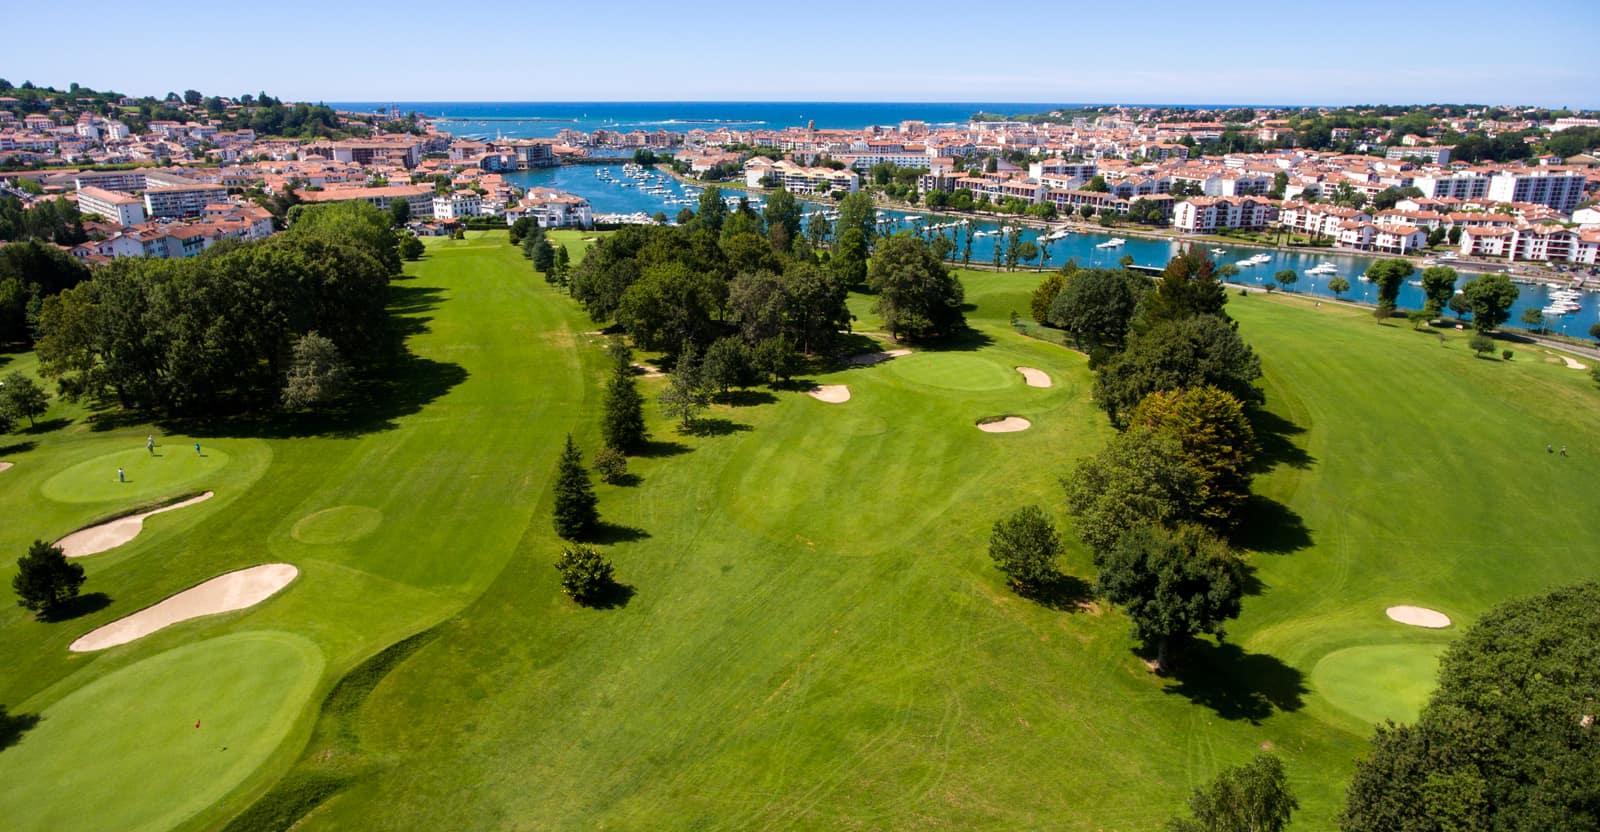 competition-barnes-golf-nivelle-ciboure-15-aout-2019